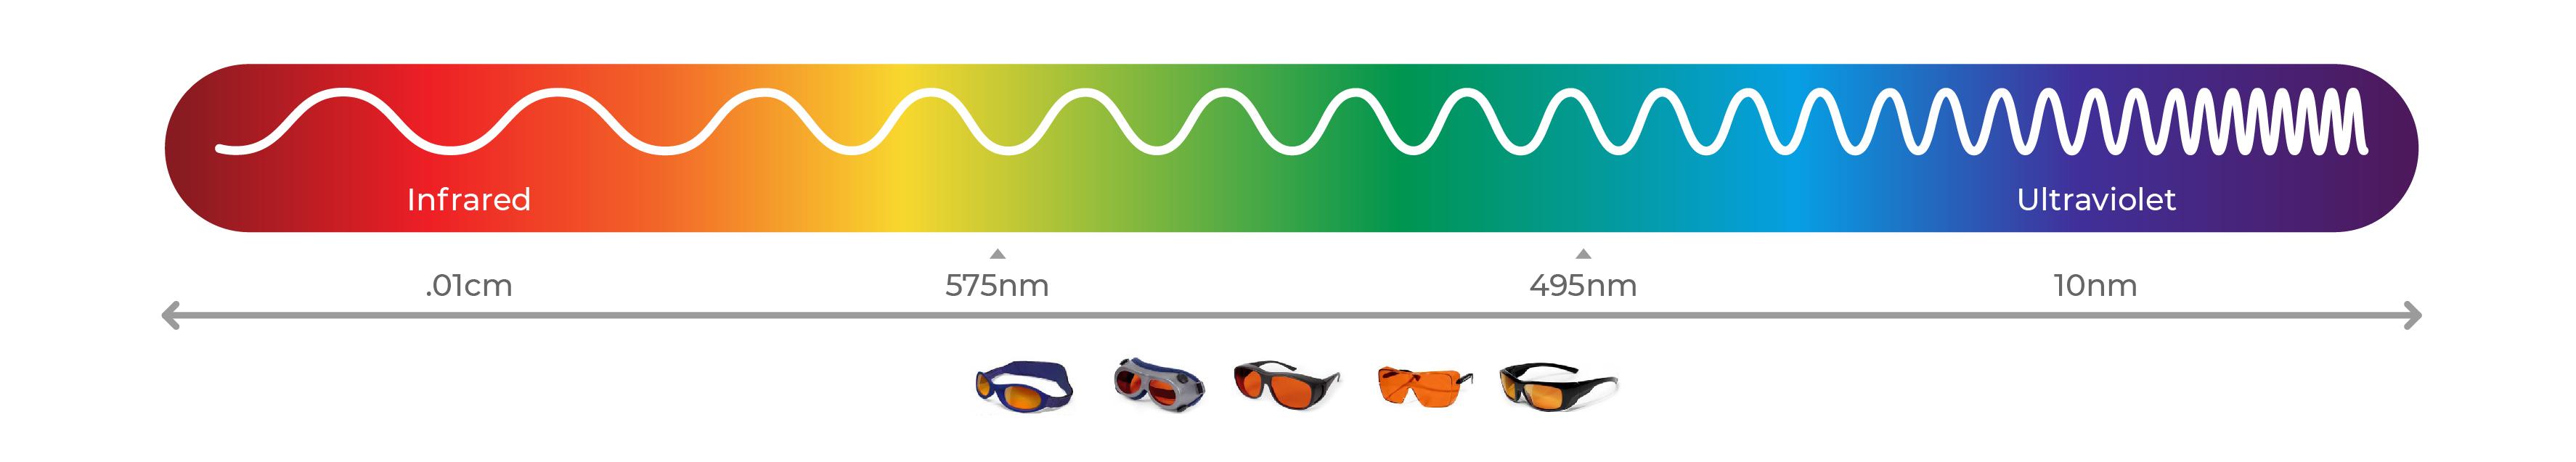 Green Laser Safety Glasses Spectrum